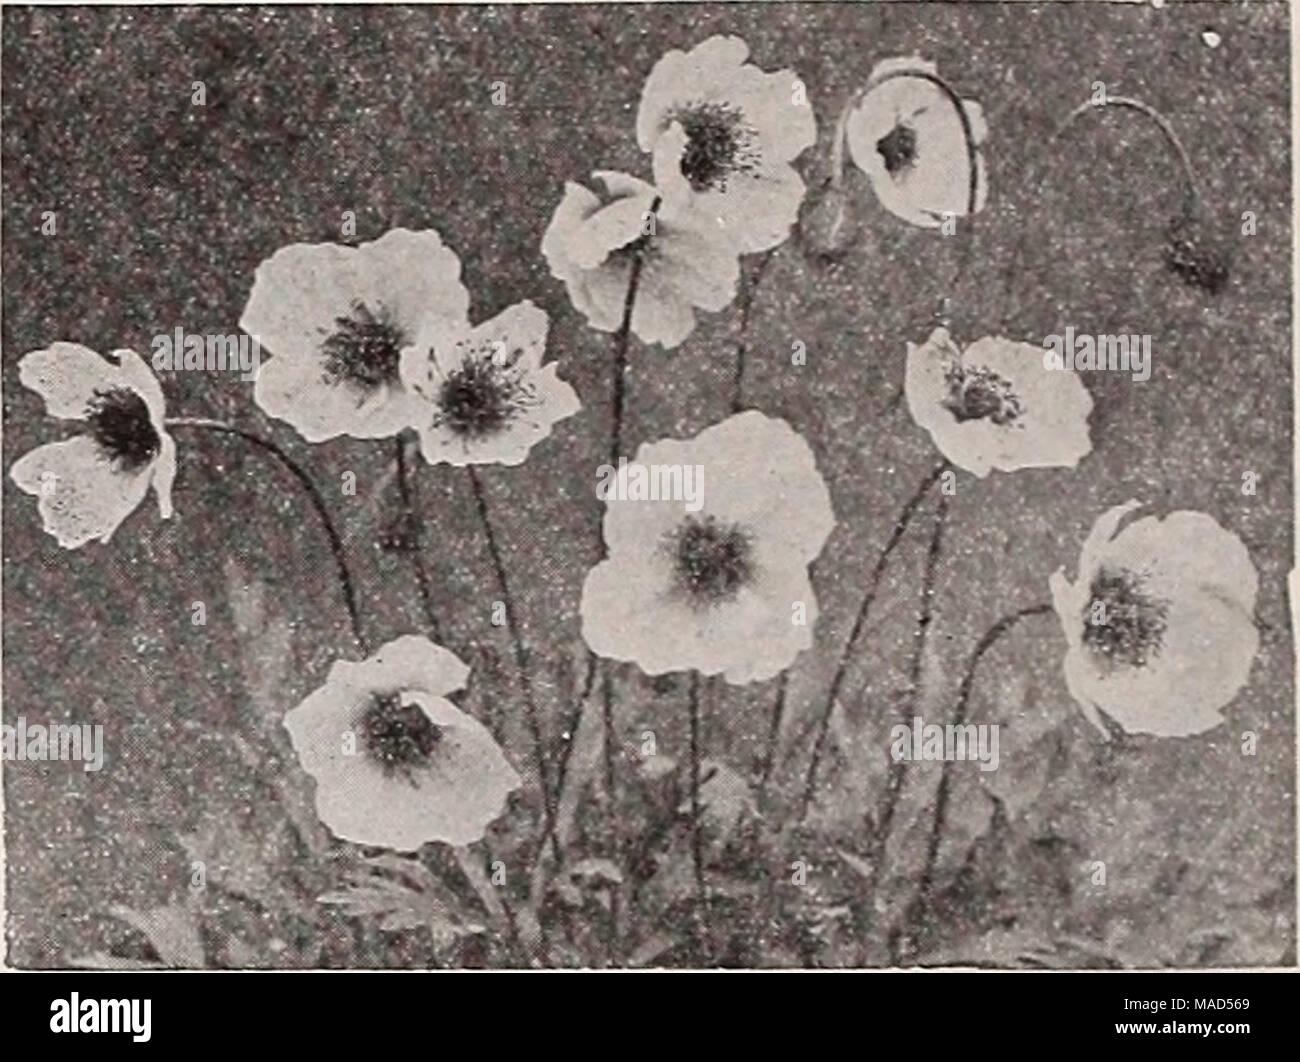 Deep pink california poppy stock photos deep pink california poppy dreers wholesale catalog for florists winter spring summer 1938 papaver nudlcaule mightylinksfo